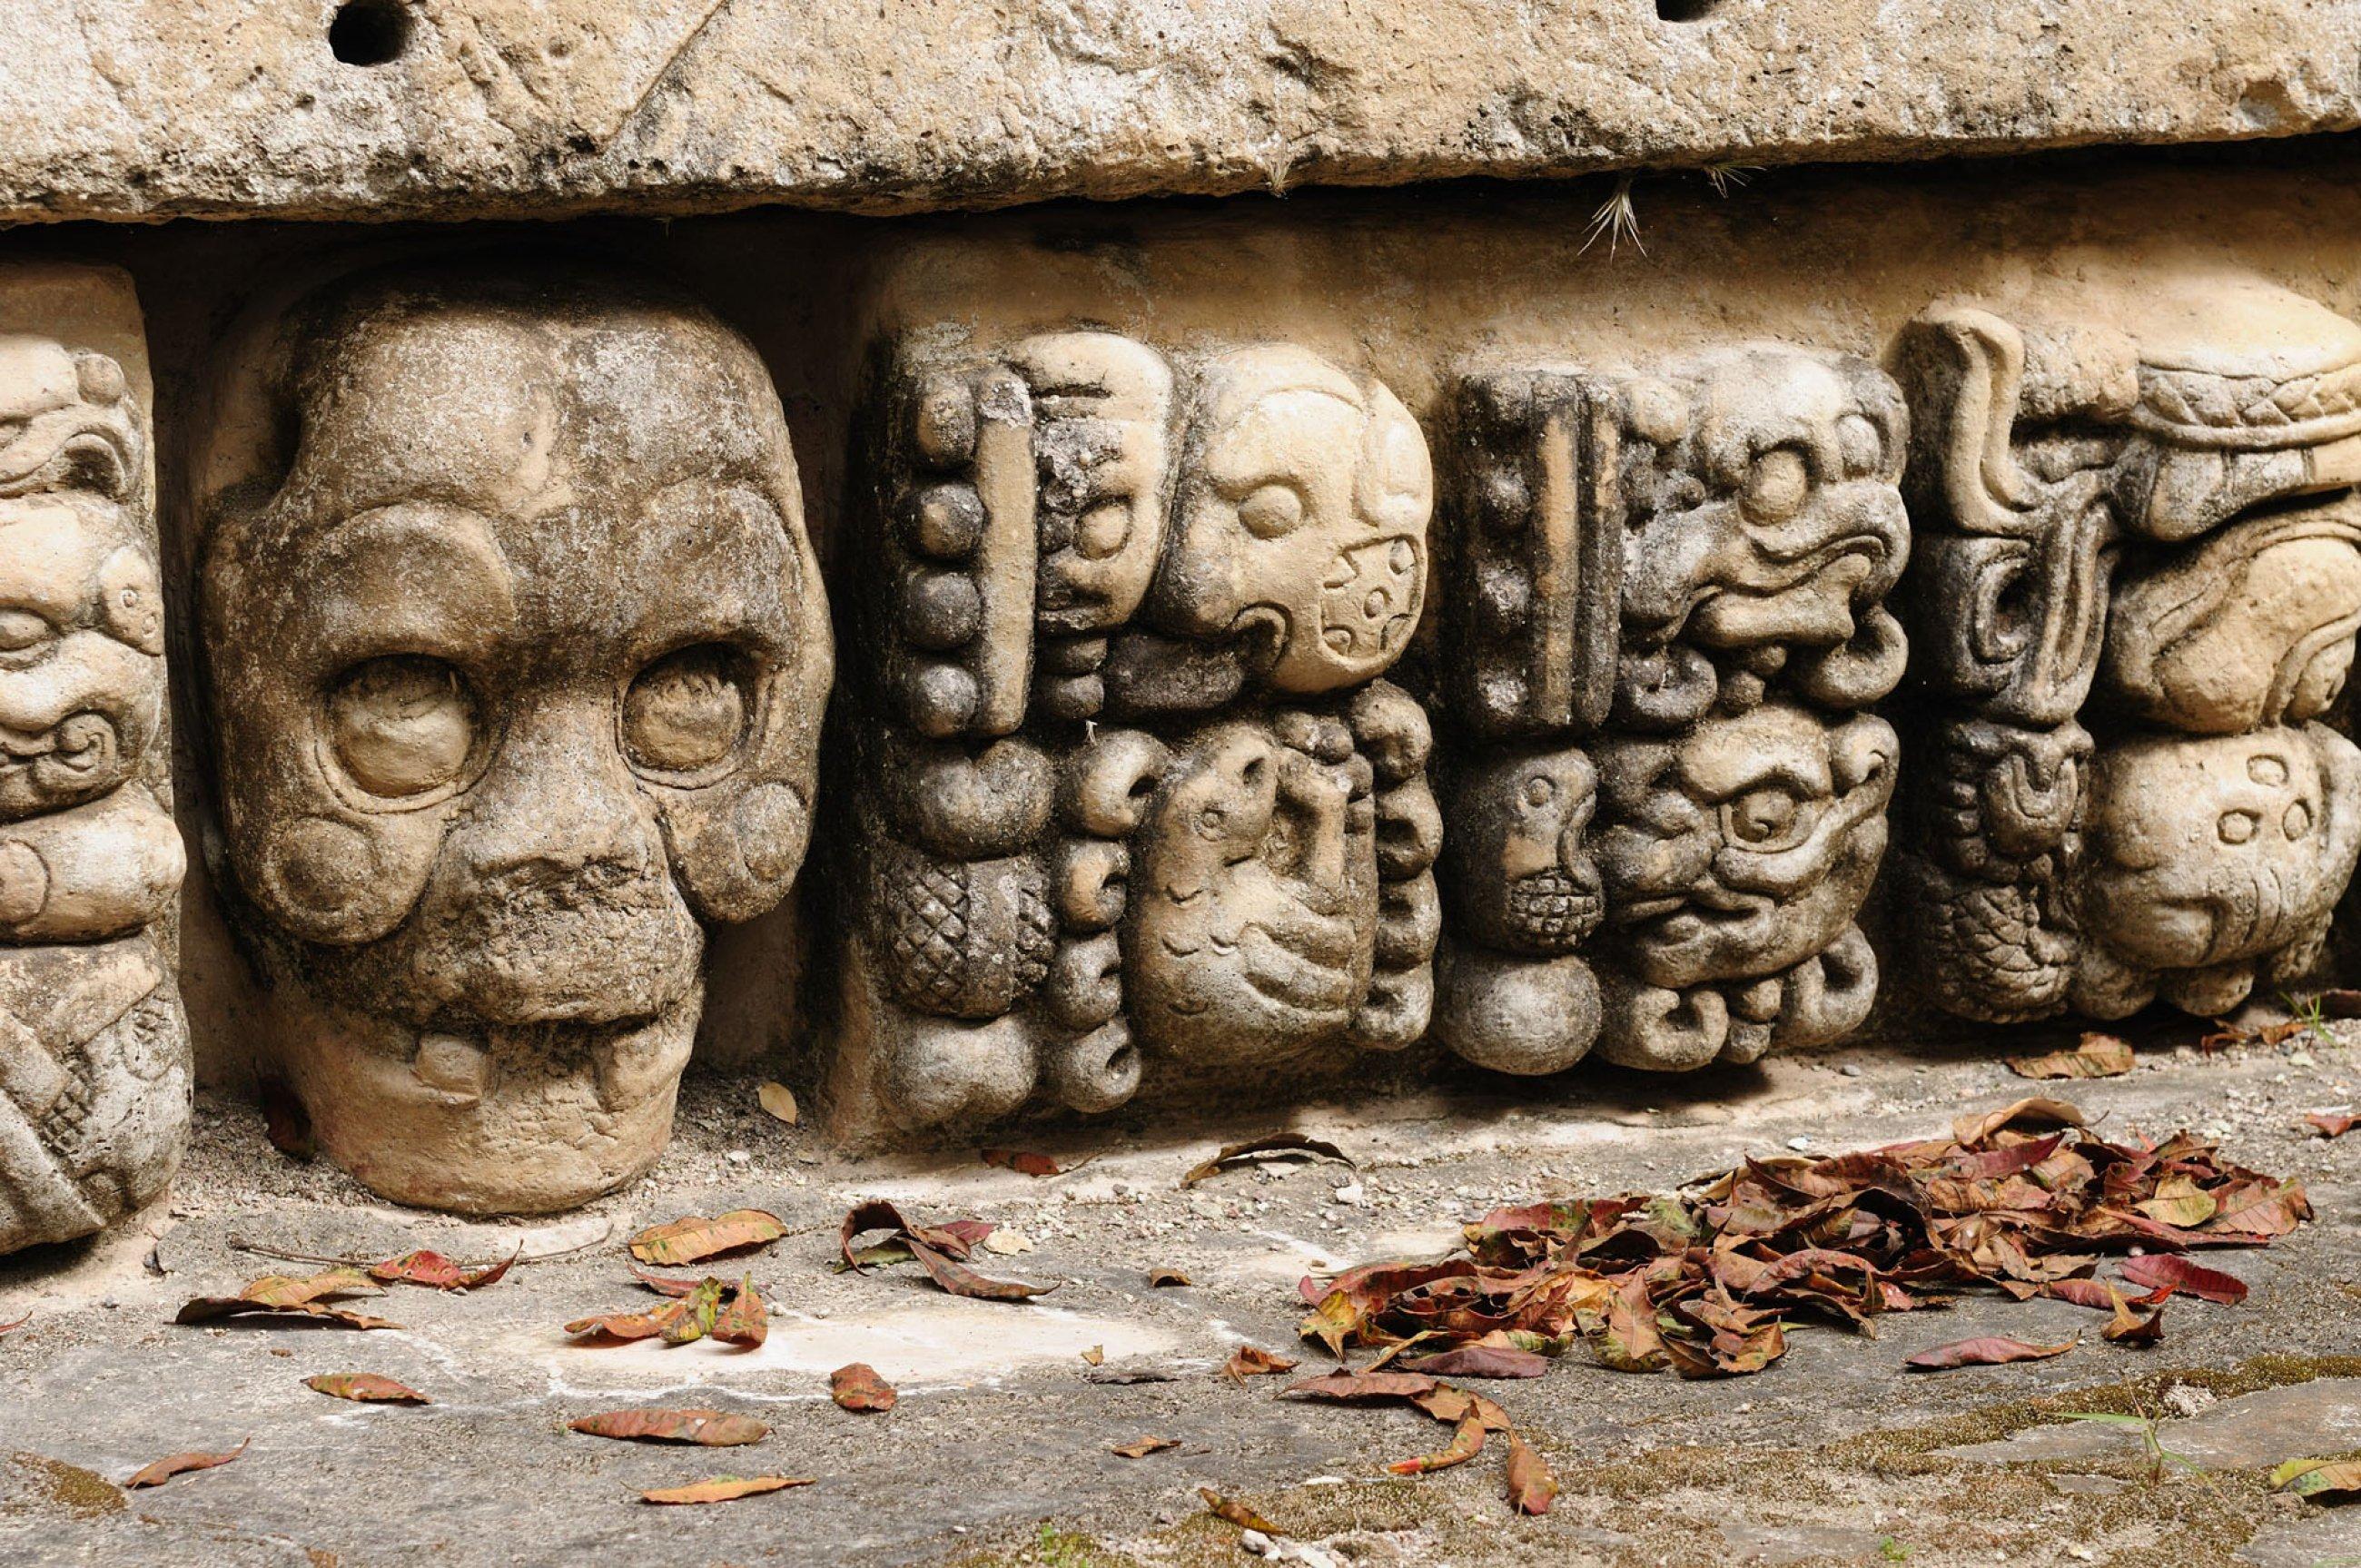 https://bubo.sk/uploads/galleries/7388/copan-mayan-ruins-in-honduras-dreamstime-xl-29453483.jpg